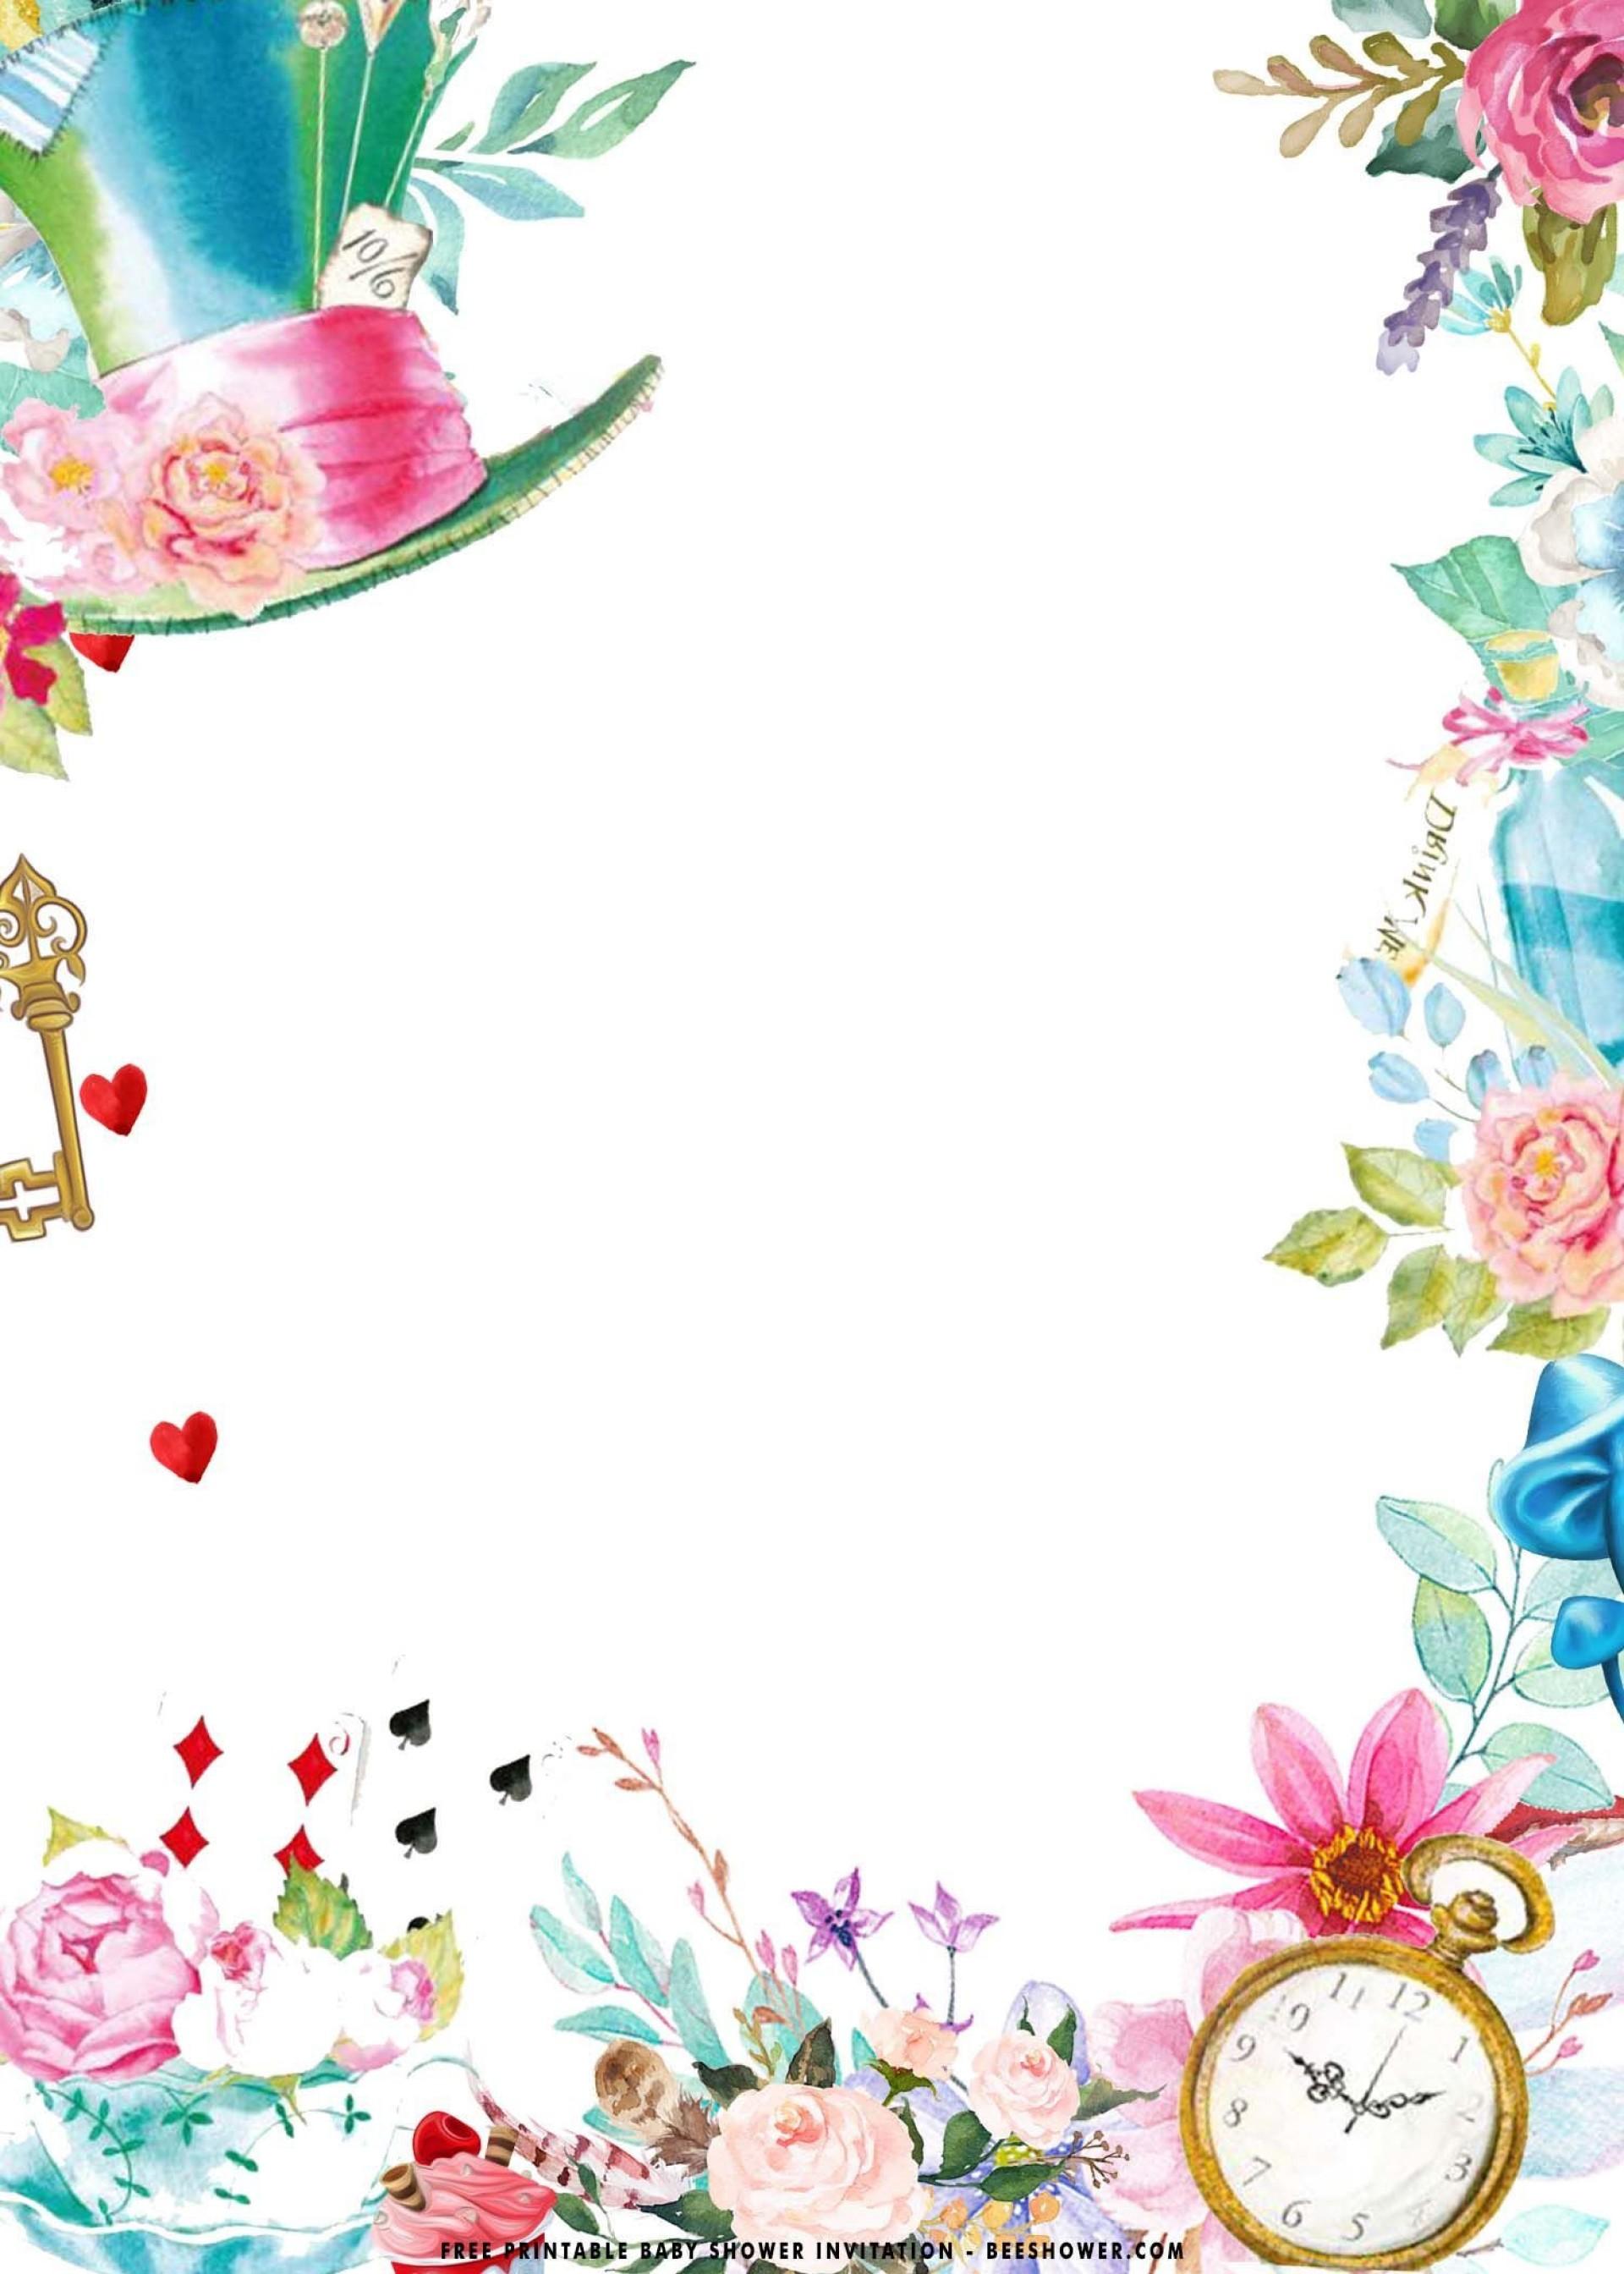 002 Impressive Alice In Wonderland Tea Party Template High Definition  Templates Invitation Free1920